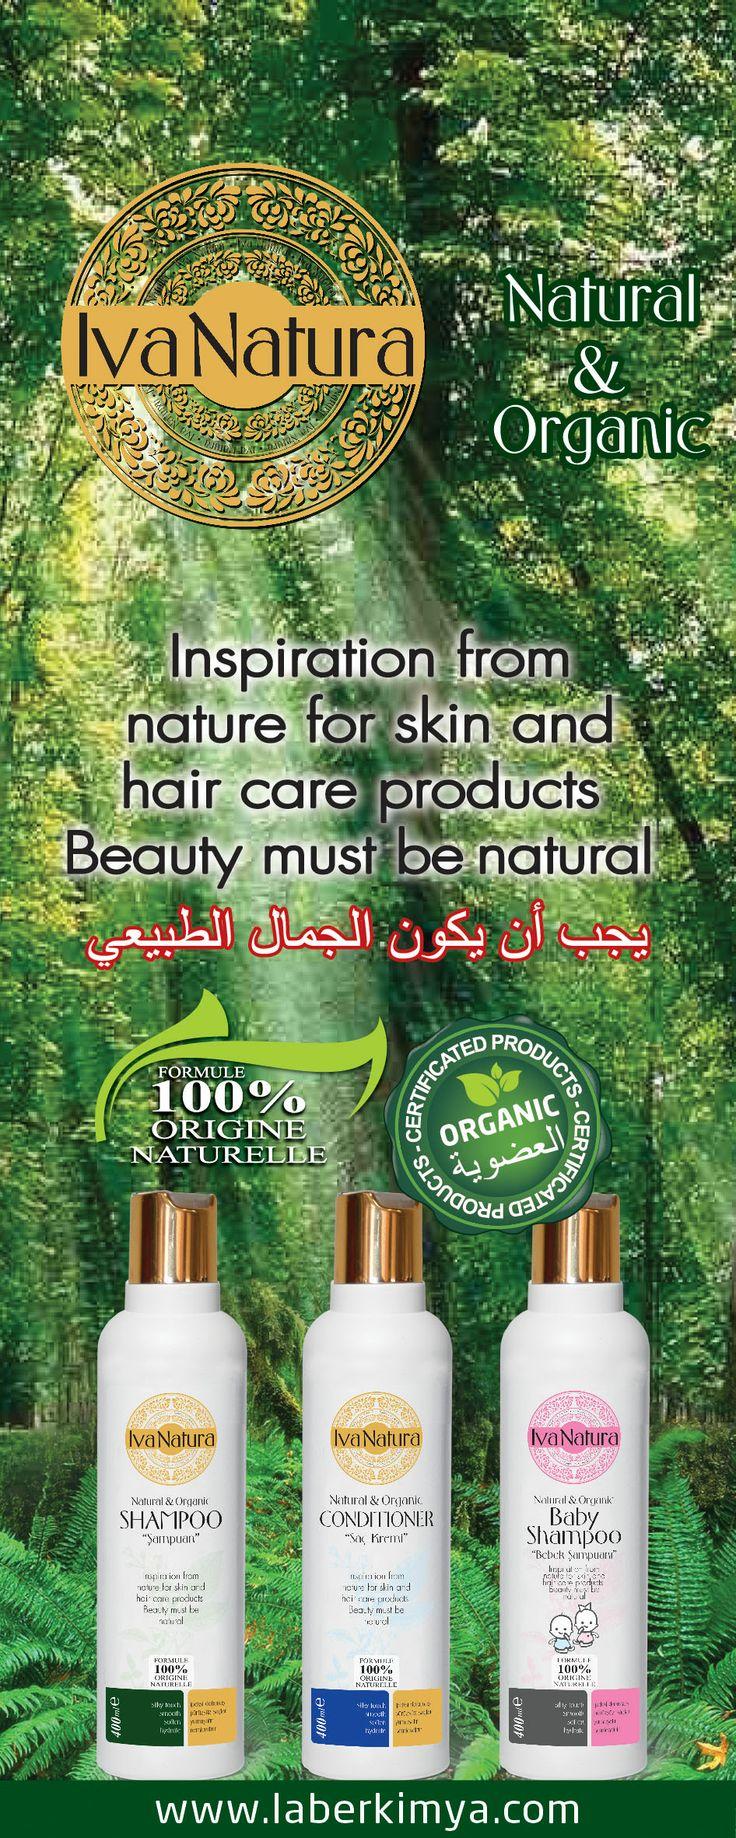 ıva natura beauty must be natural organic cosmetics organic certificated beauty products